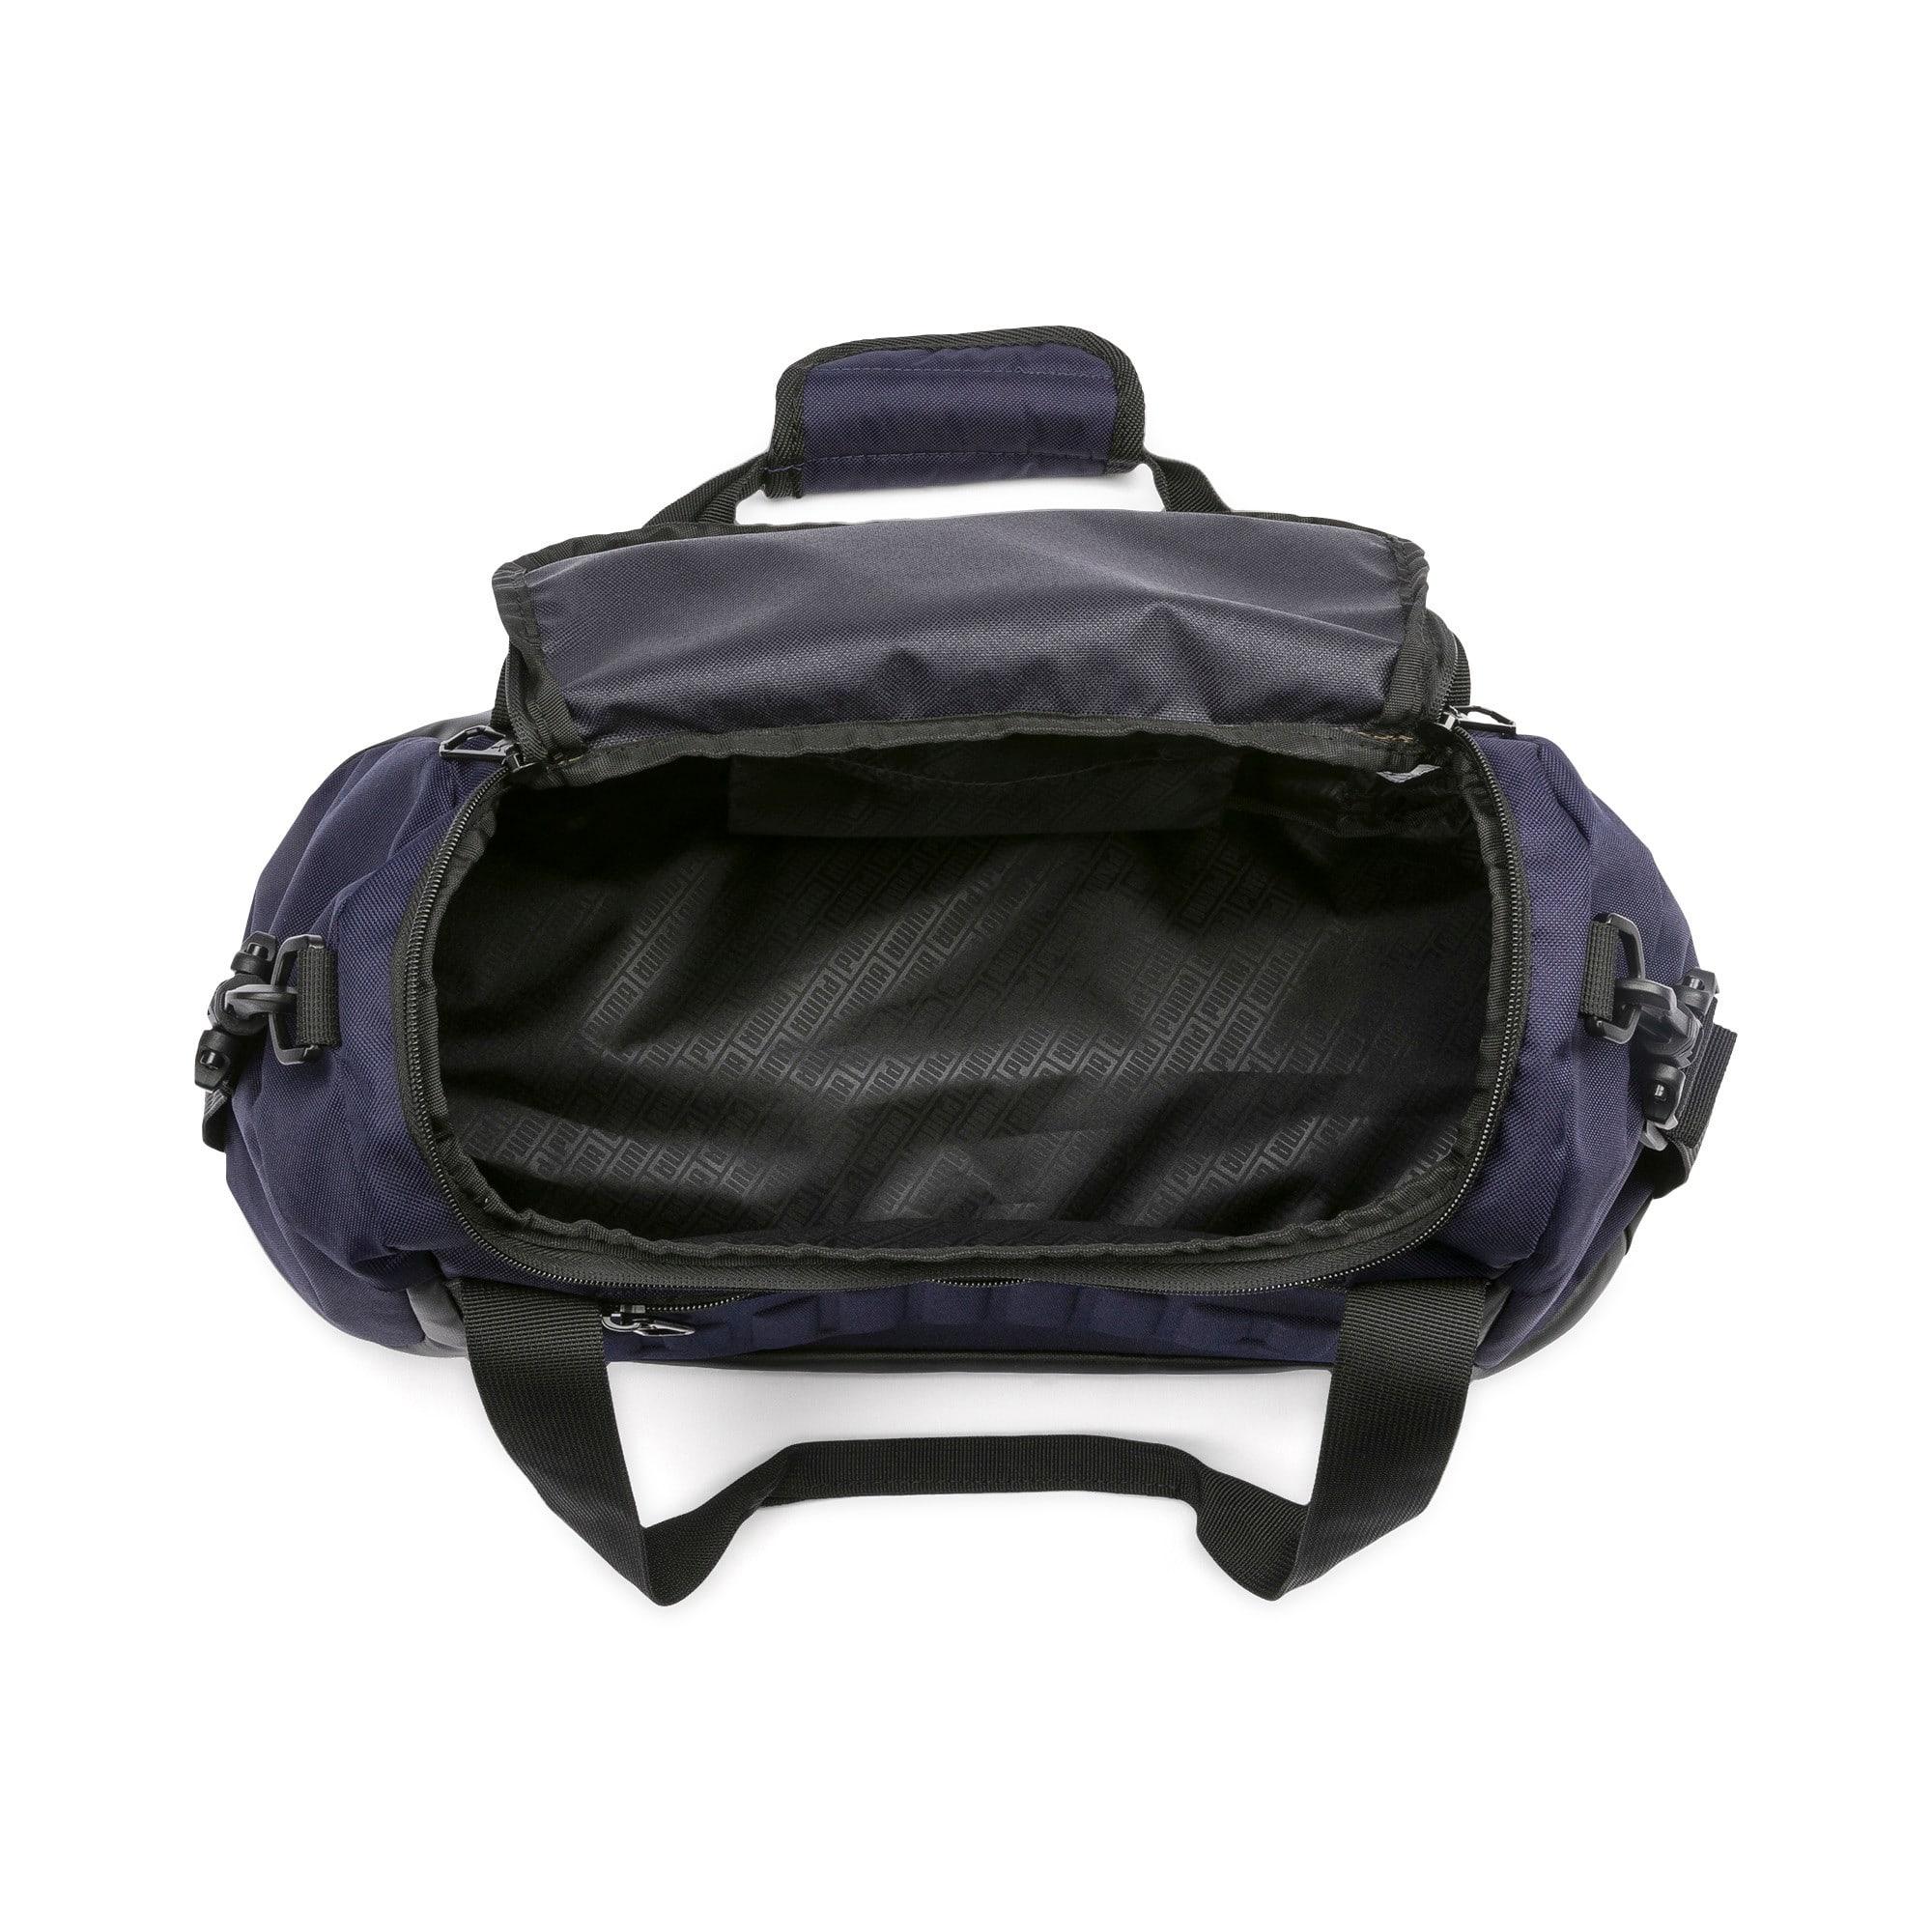 Thumbnail 3 of Gym Duffel Bag, Peacoat, medium-IND